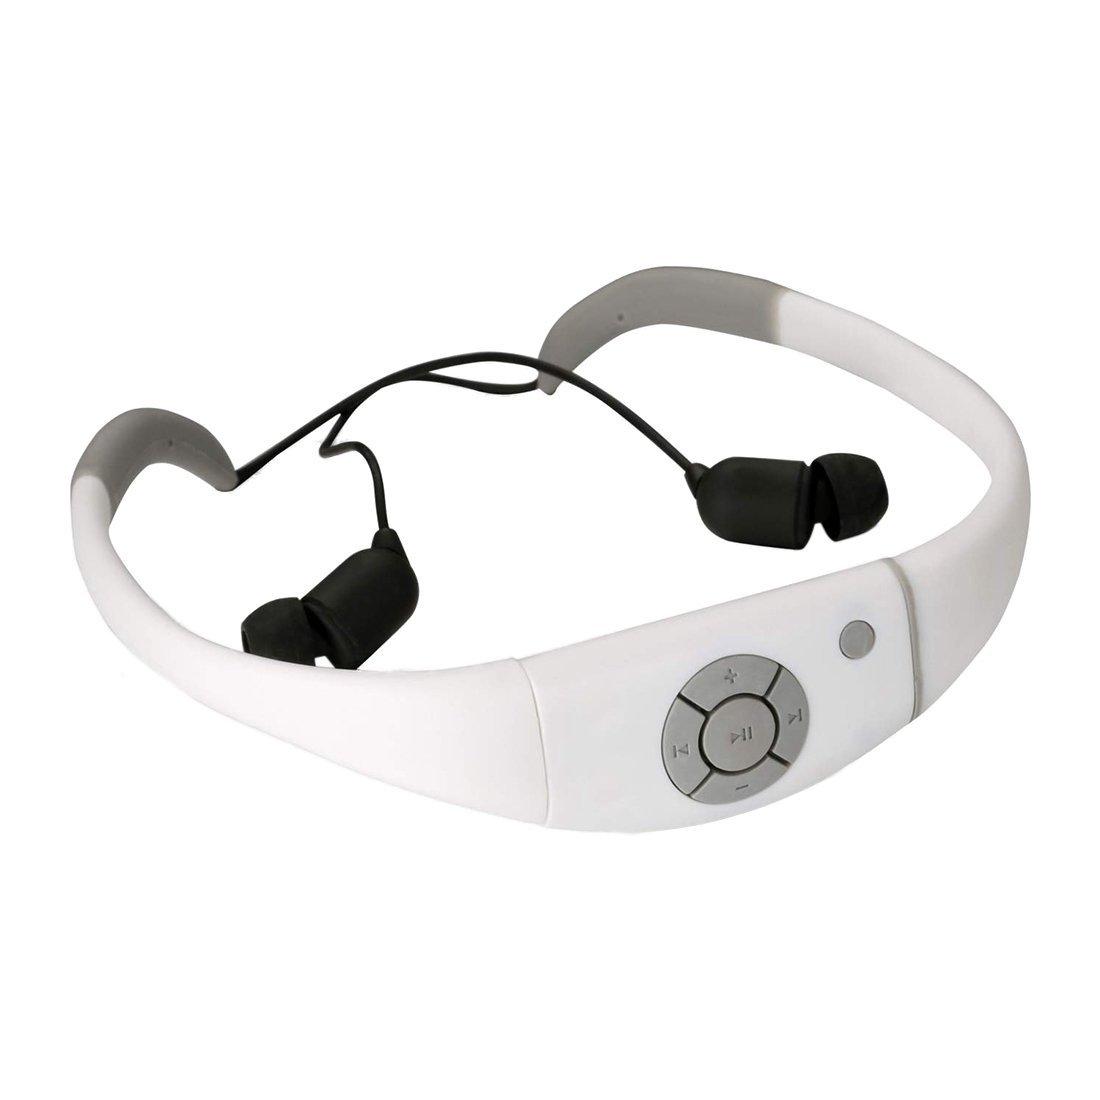 SODIAL(R) Waterproof Mp3 Headset Music Player, 8gb Memory Hi-fi Stero Earphone with Fm Radio